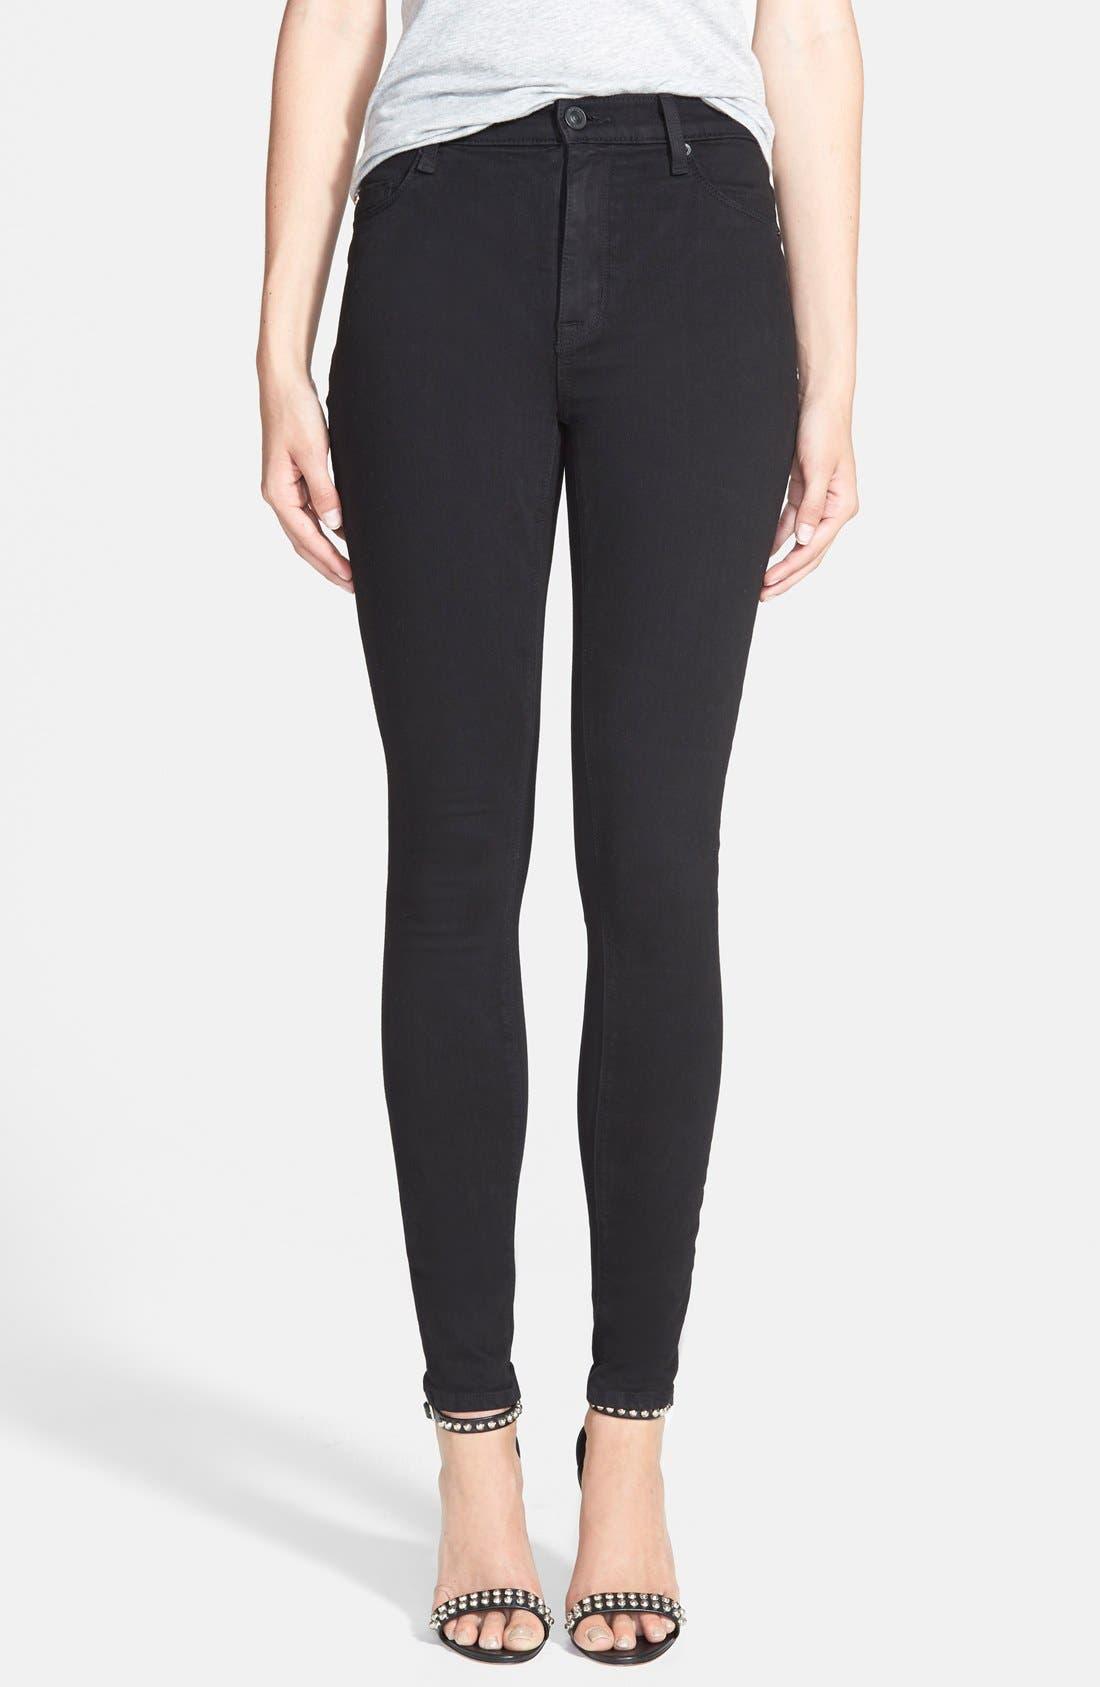 Barbara High Waist Skinny Jeans,                         Main,                         color, Black